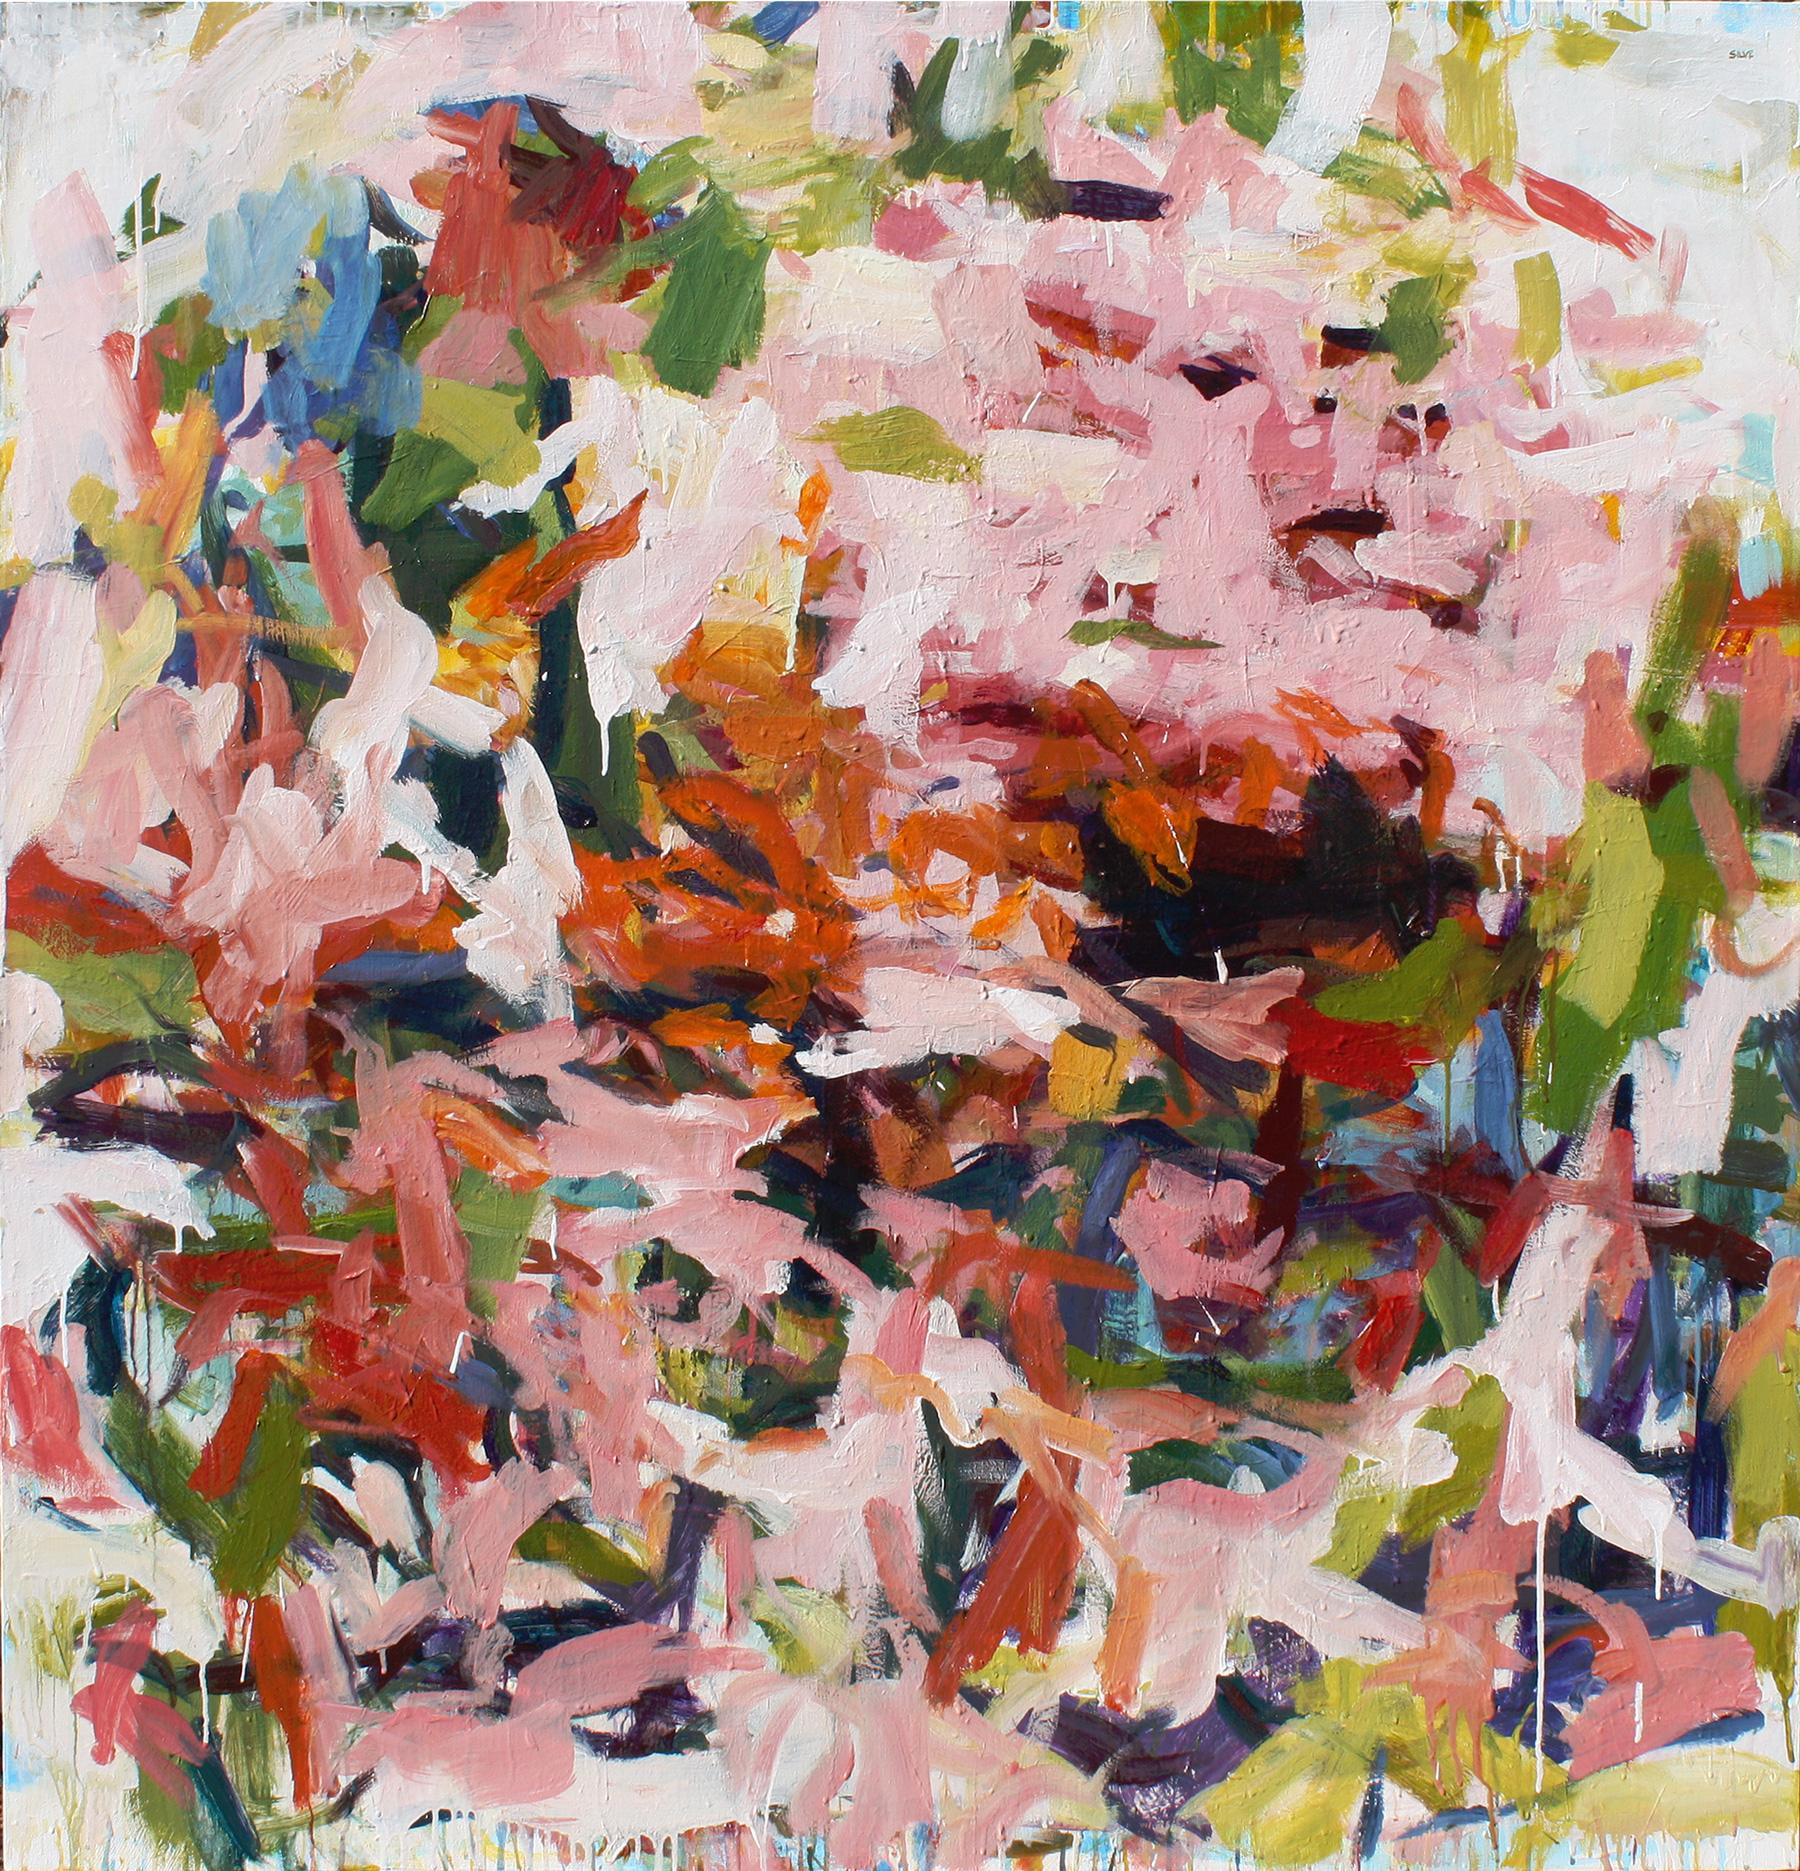 15-Lush-Chaos-2-karen-silve-1800.jpg